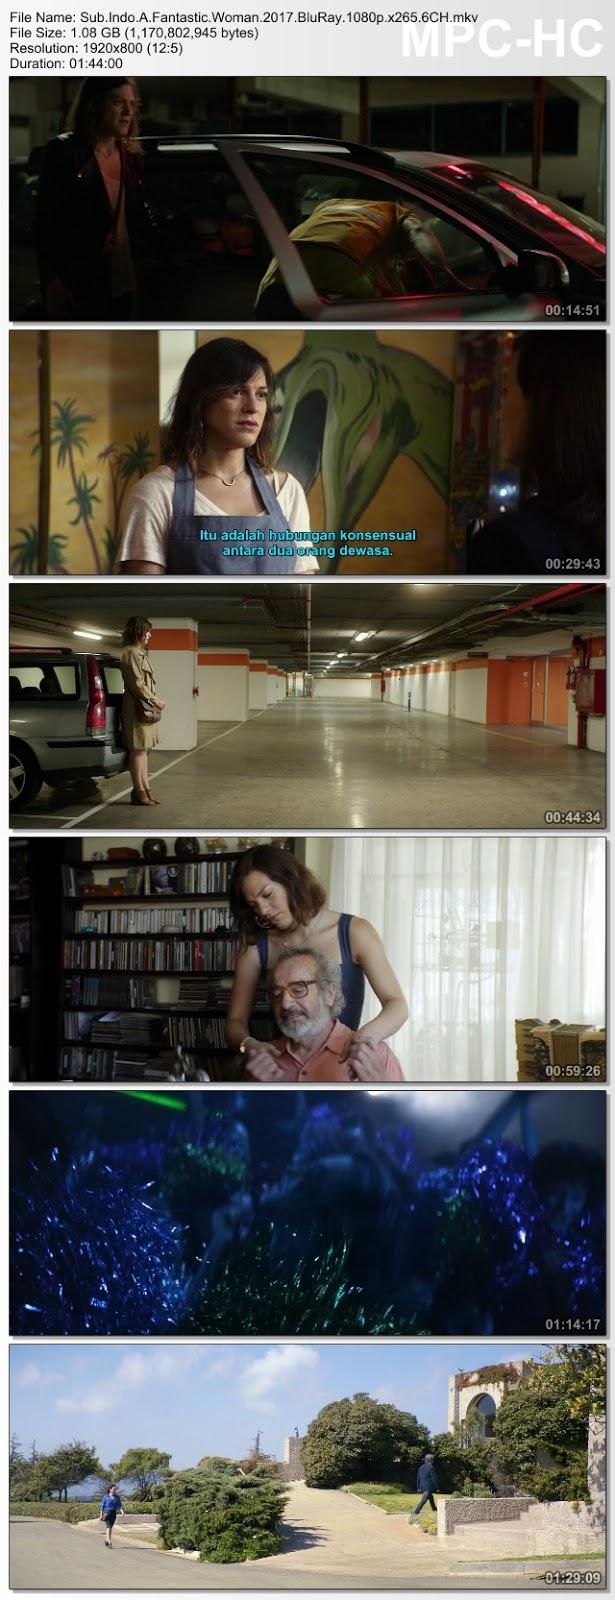 Screenshots Download Film Gratis Una Mujer Fantástica (2017) BluRay 480p MP4 Subtitle Bahasa Indonesia 3GP